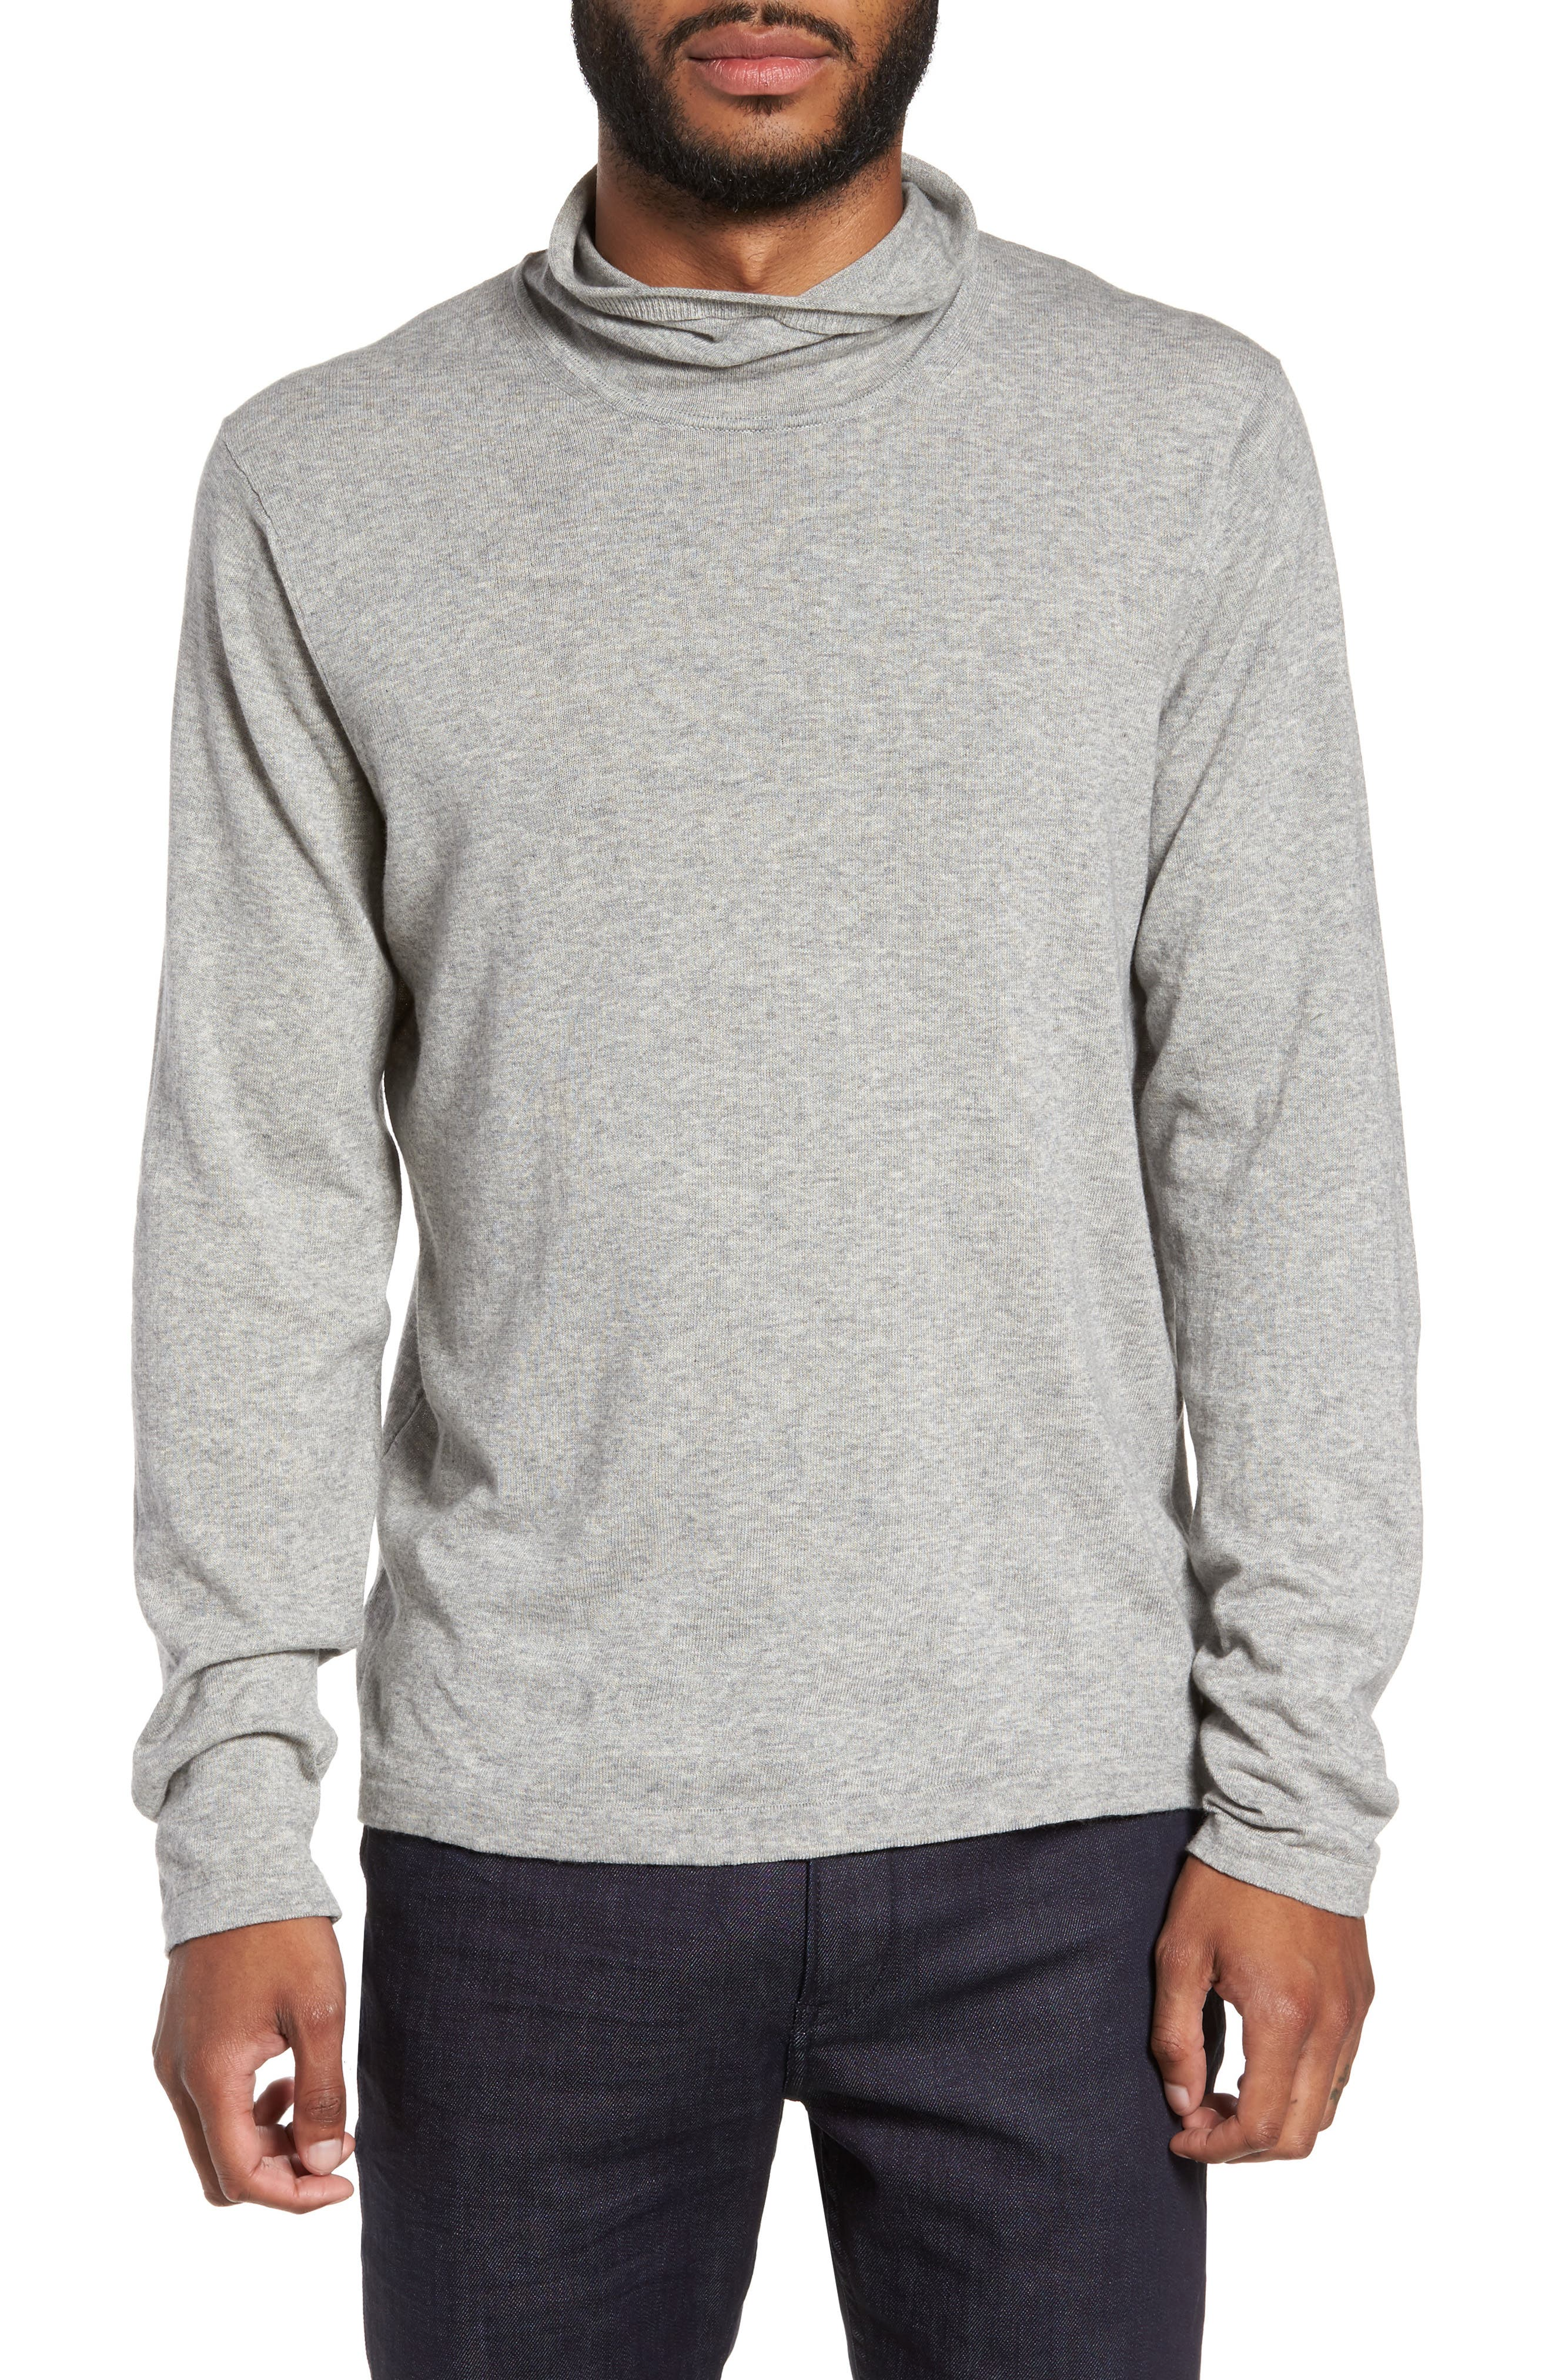 Hess Wool Turtleneck Sweater,                         Main,                         color,